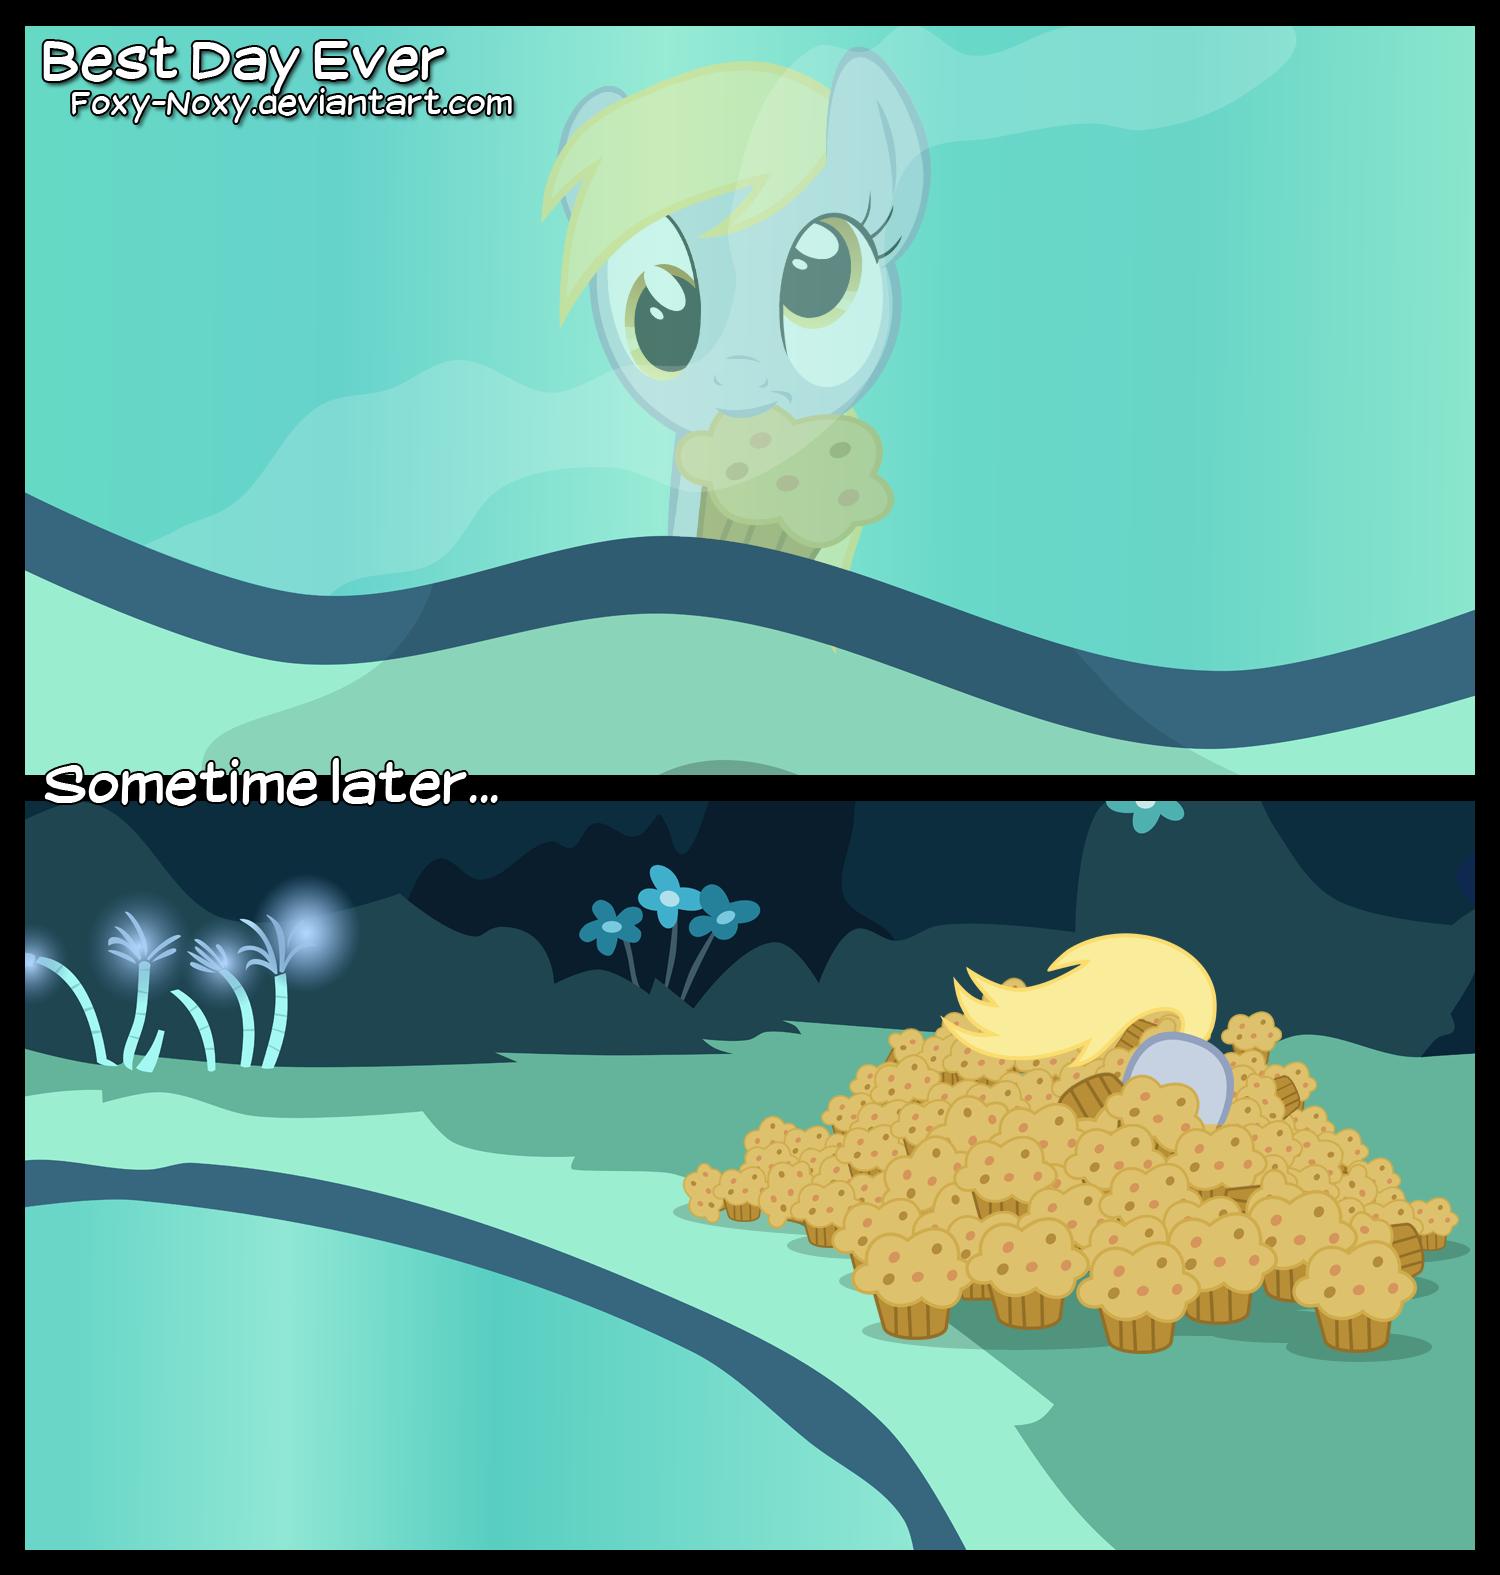 Muffins. Infinite paradise! foxy-noxy.deviantart.com/art/Best-Day.... Muffins Infinite paradise! foxy-noxy deviantart com/art/Best-Day